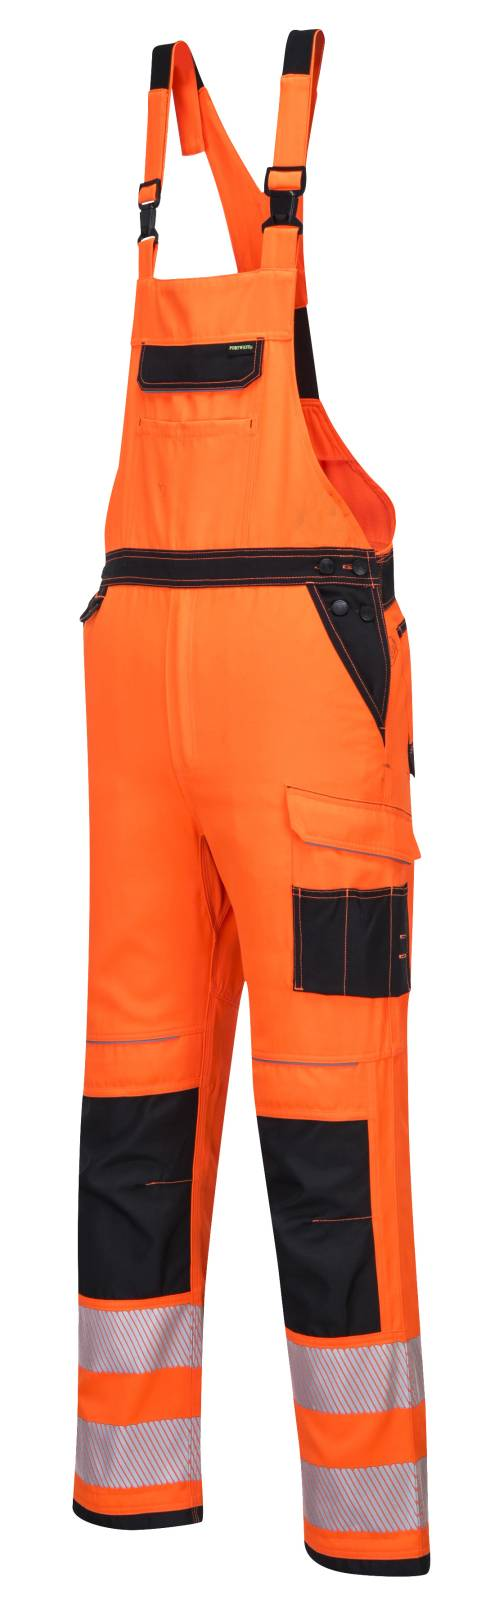 Portwest Am. Overalls PW344 oranje-zwart(OB)